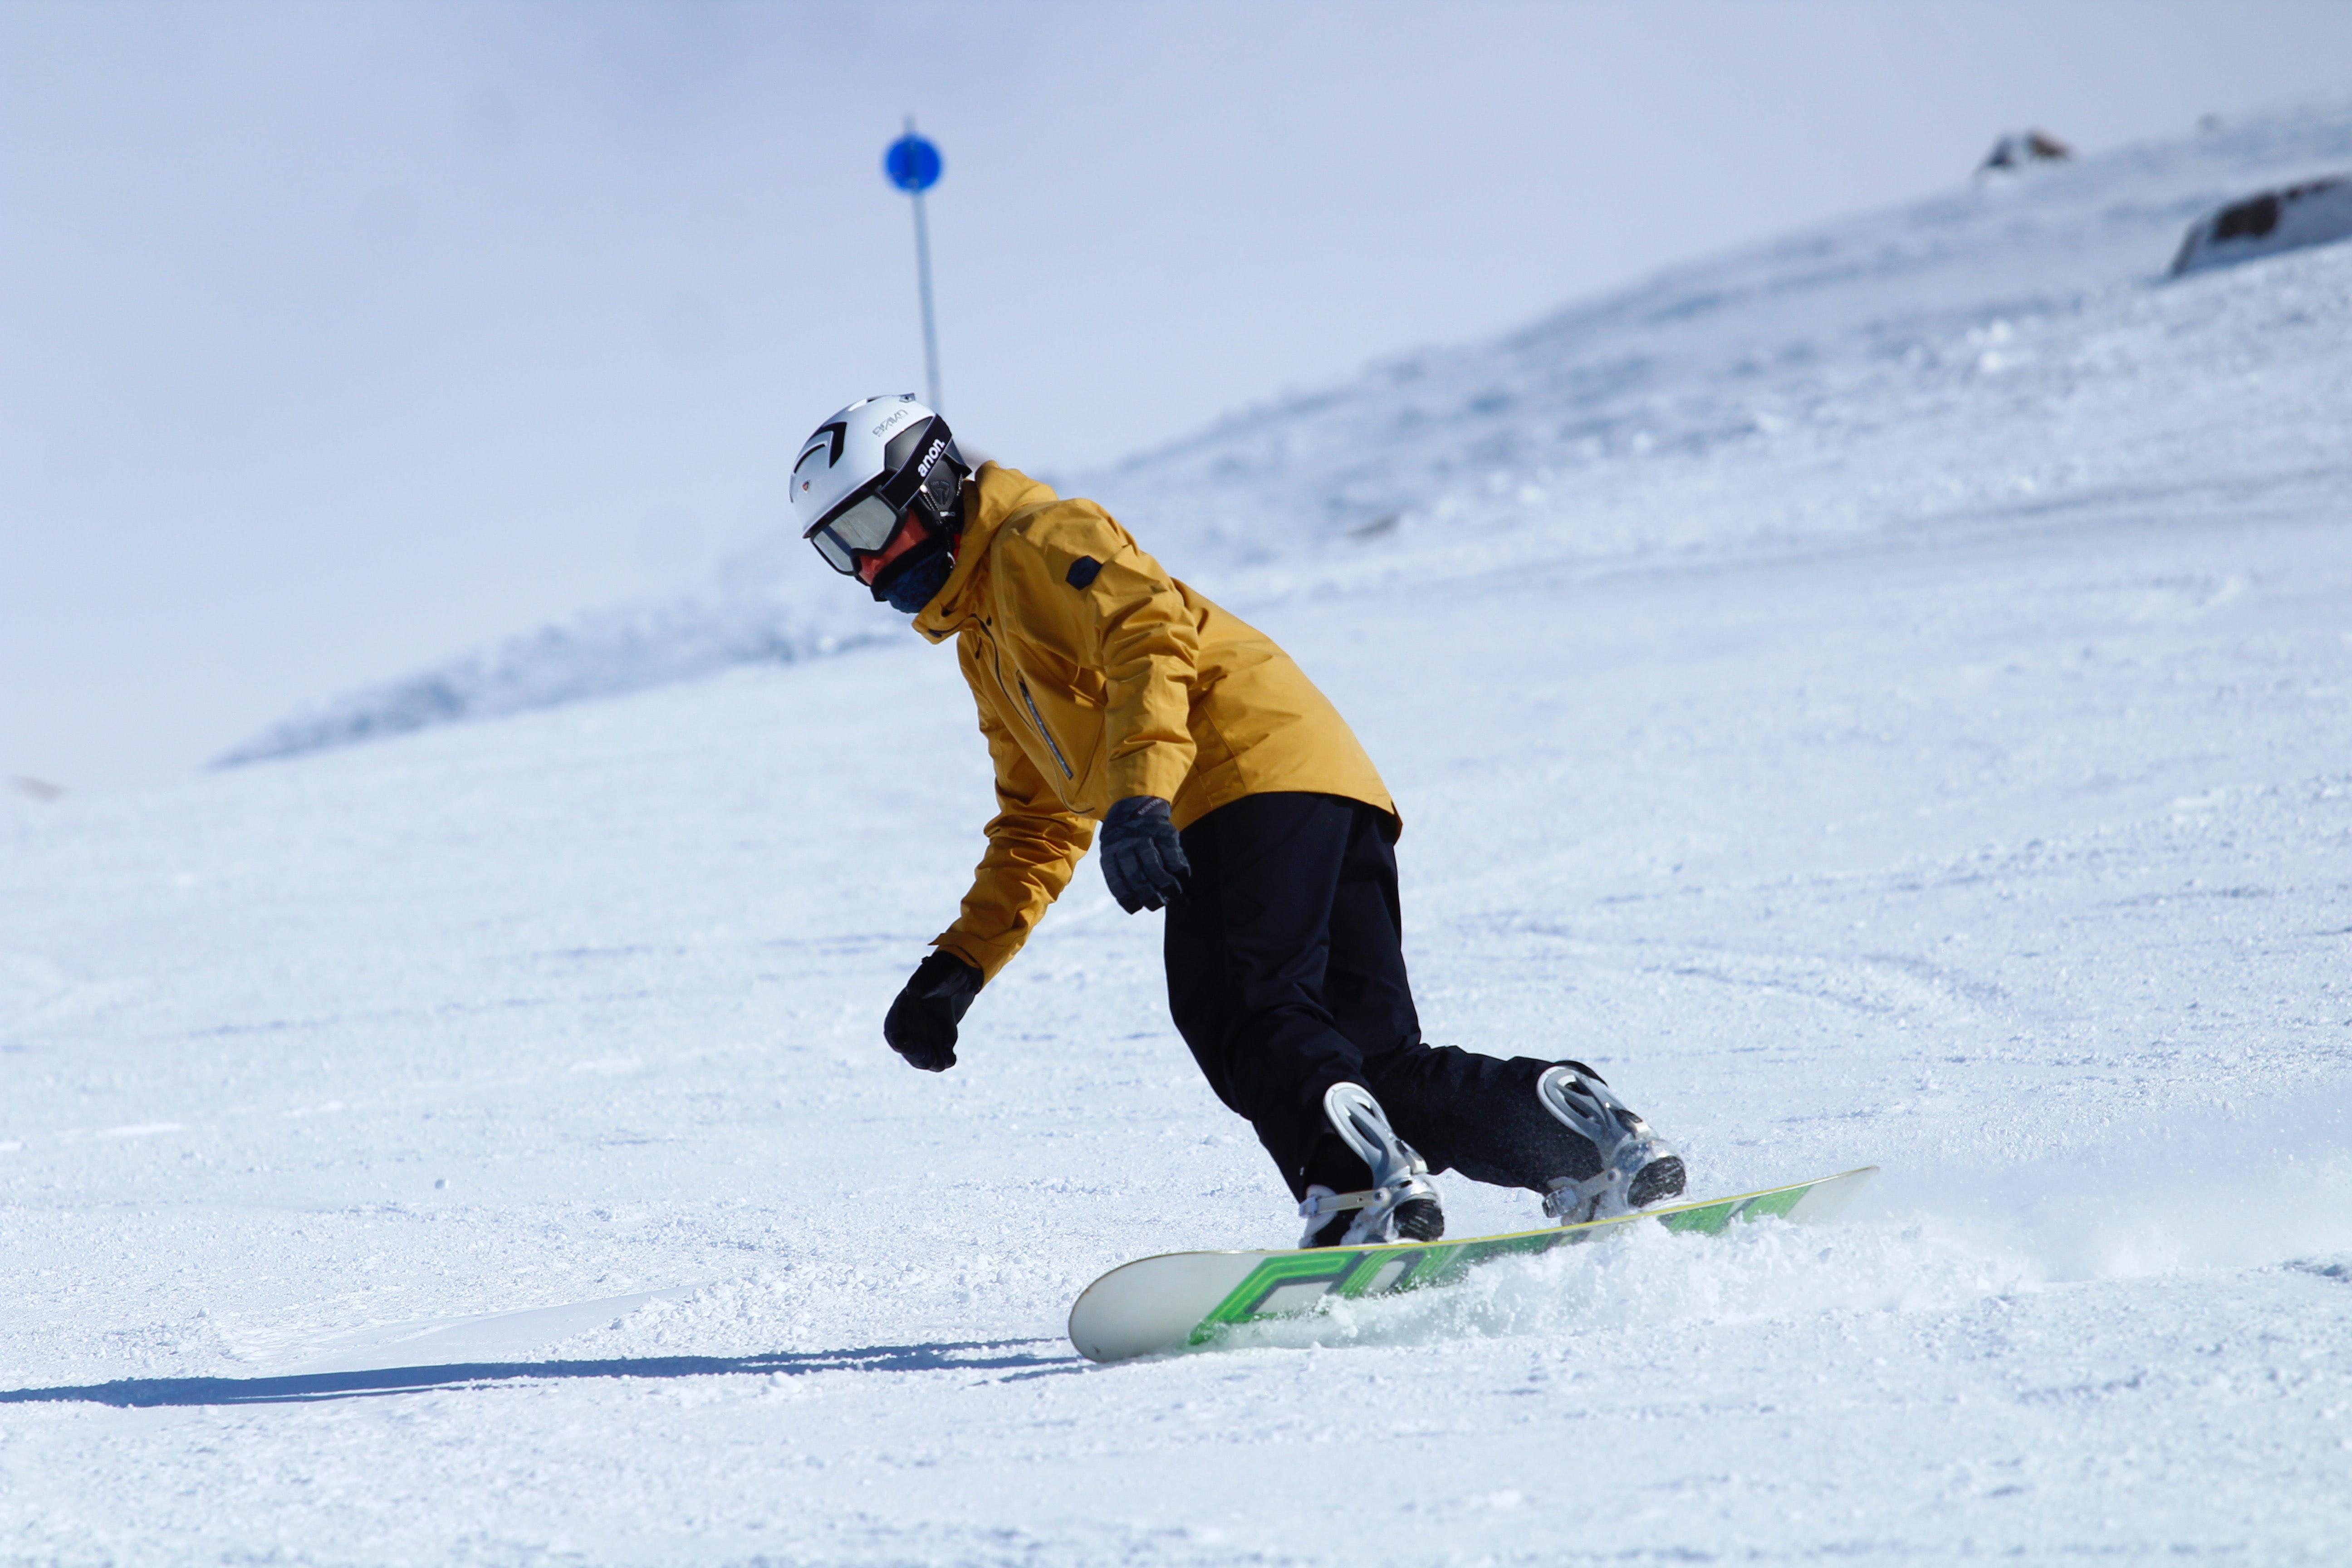 Arcos Journeys: Ski & Snowboard Camp in Patagonia